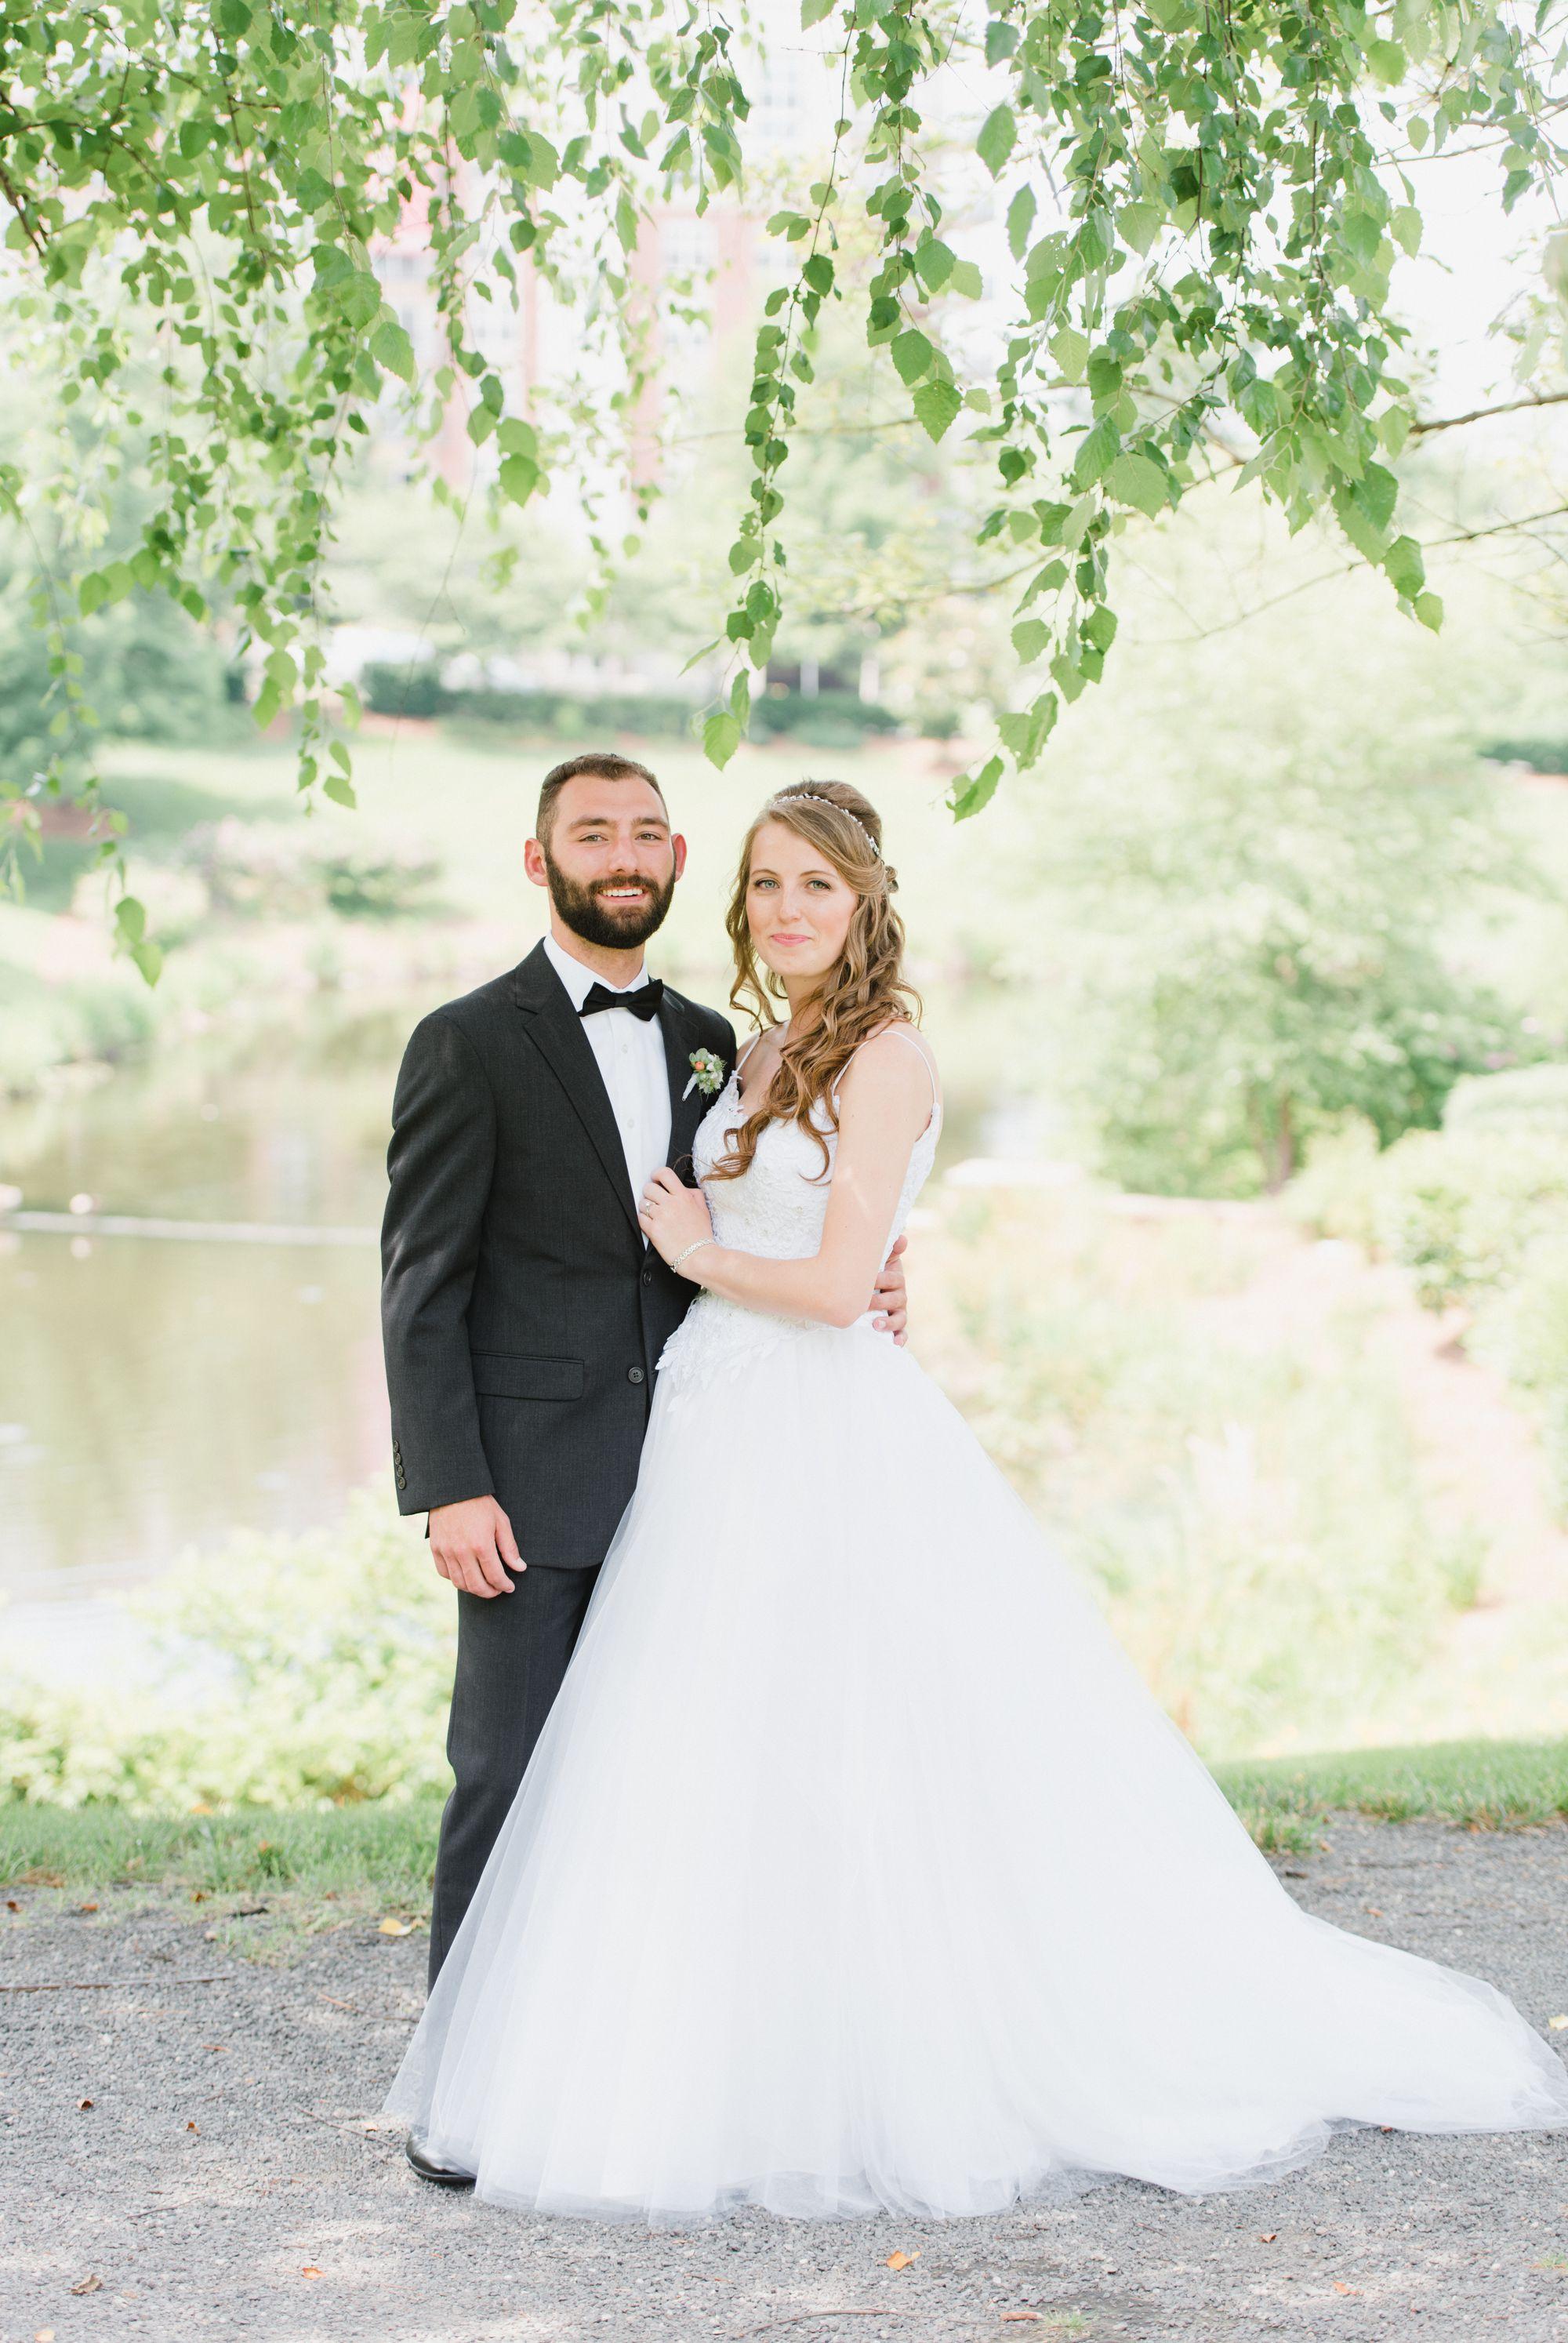 uptown-charlotte-orthodox-greek-wedding 34